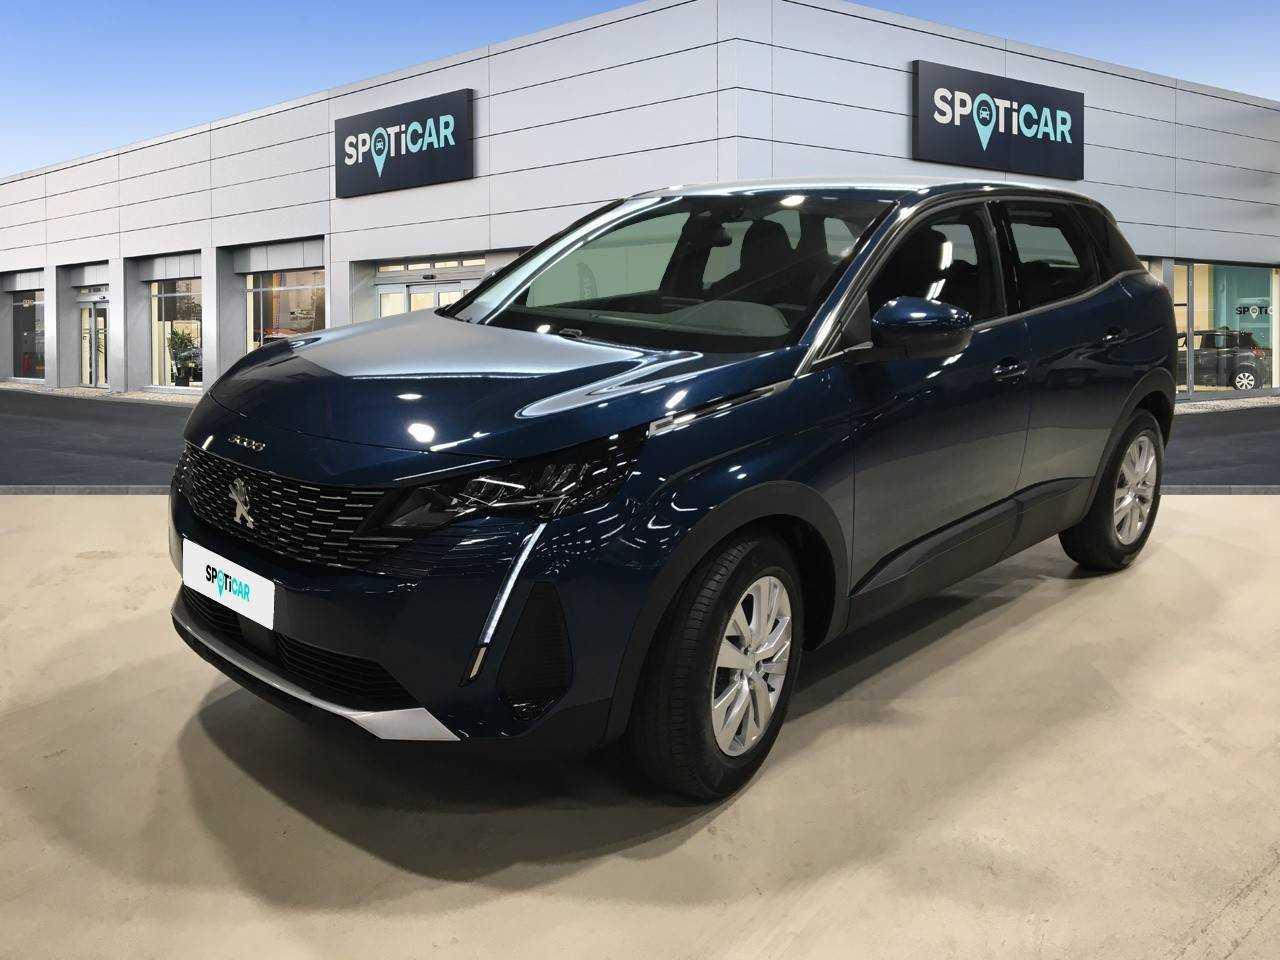 Peugeot 3008 ocasión segunda mano 2021 Diésel por 25.900€ en Madrid